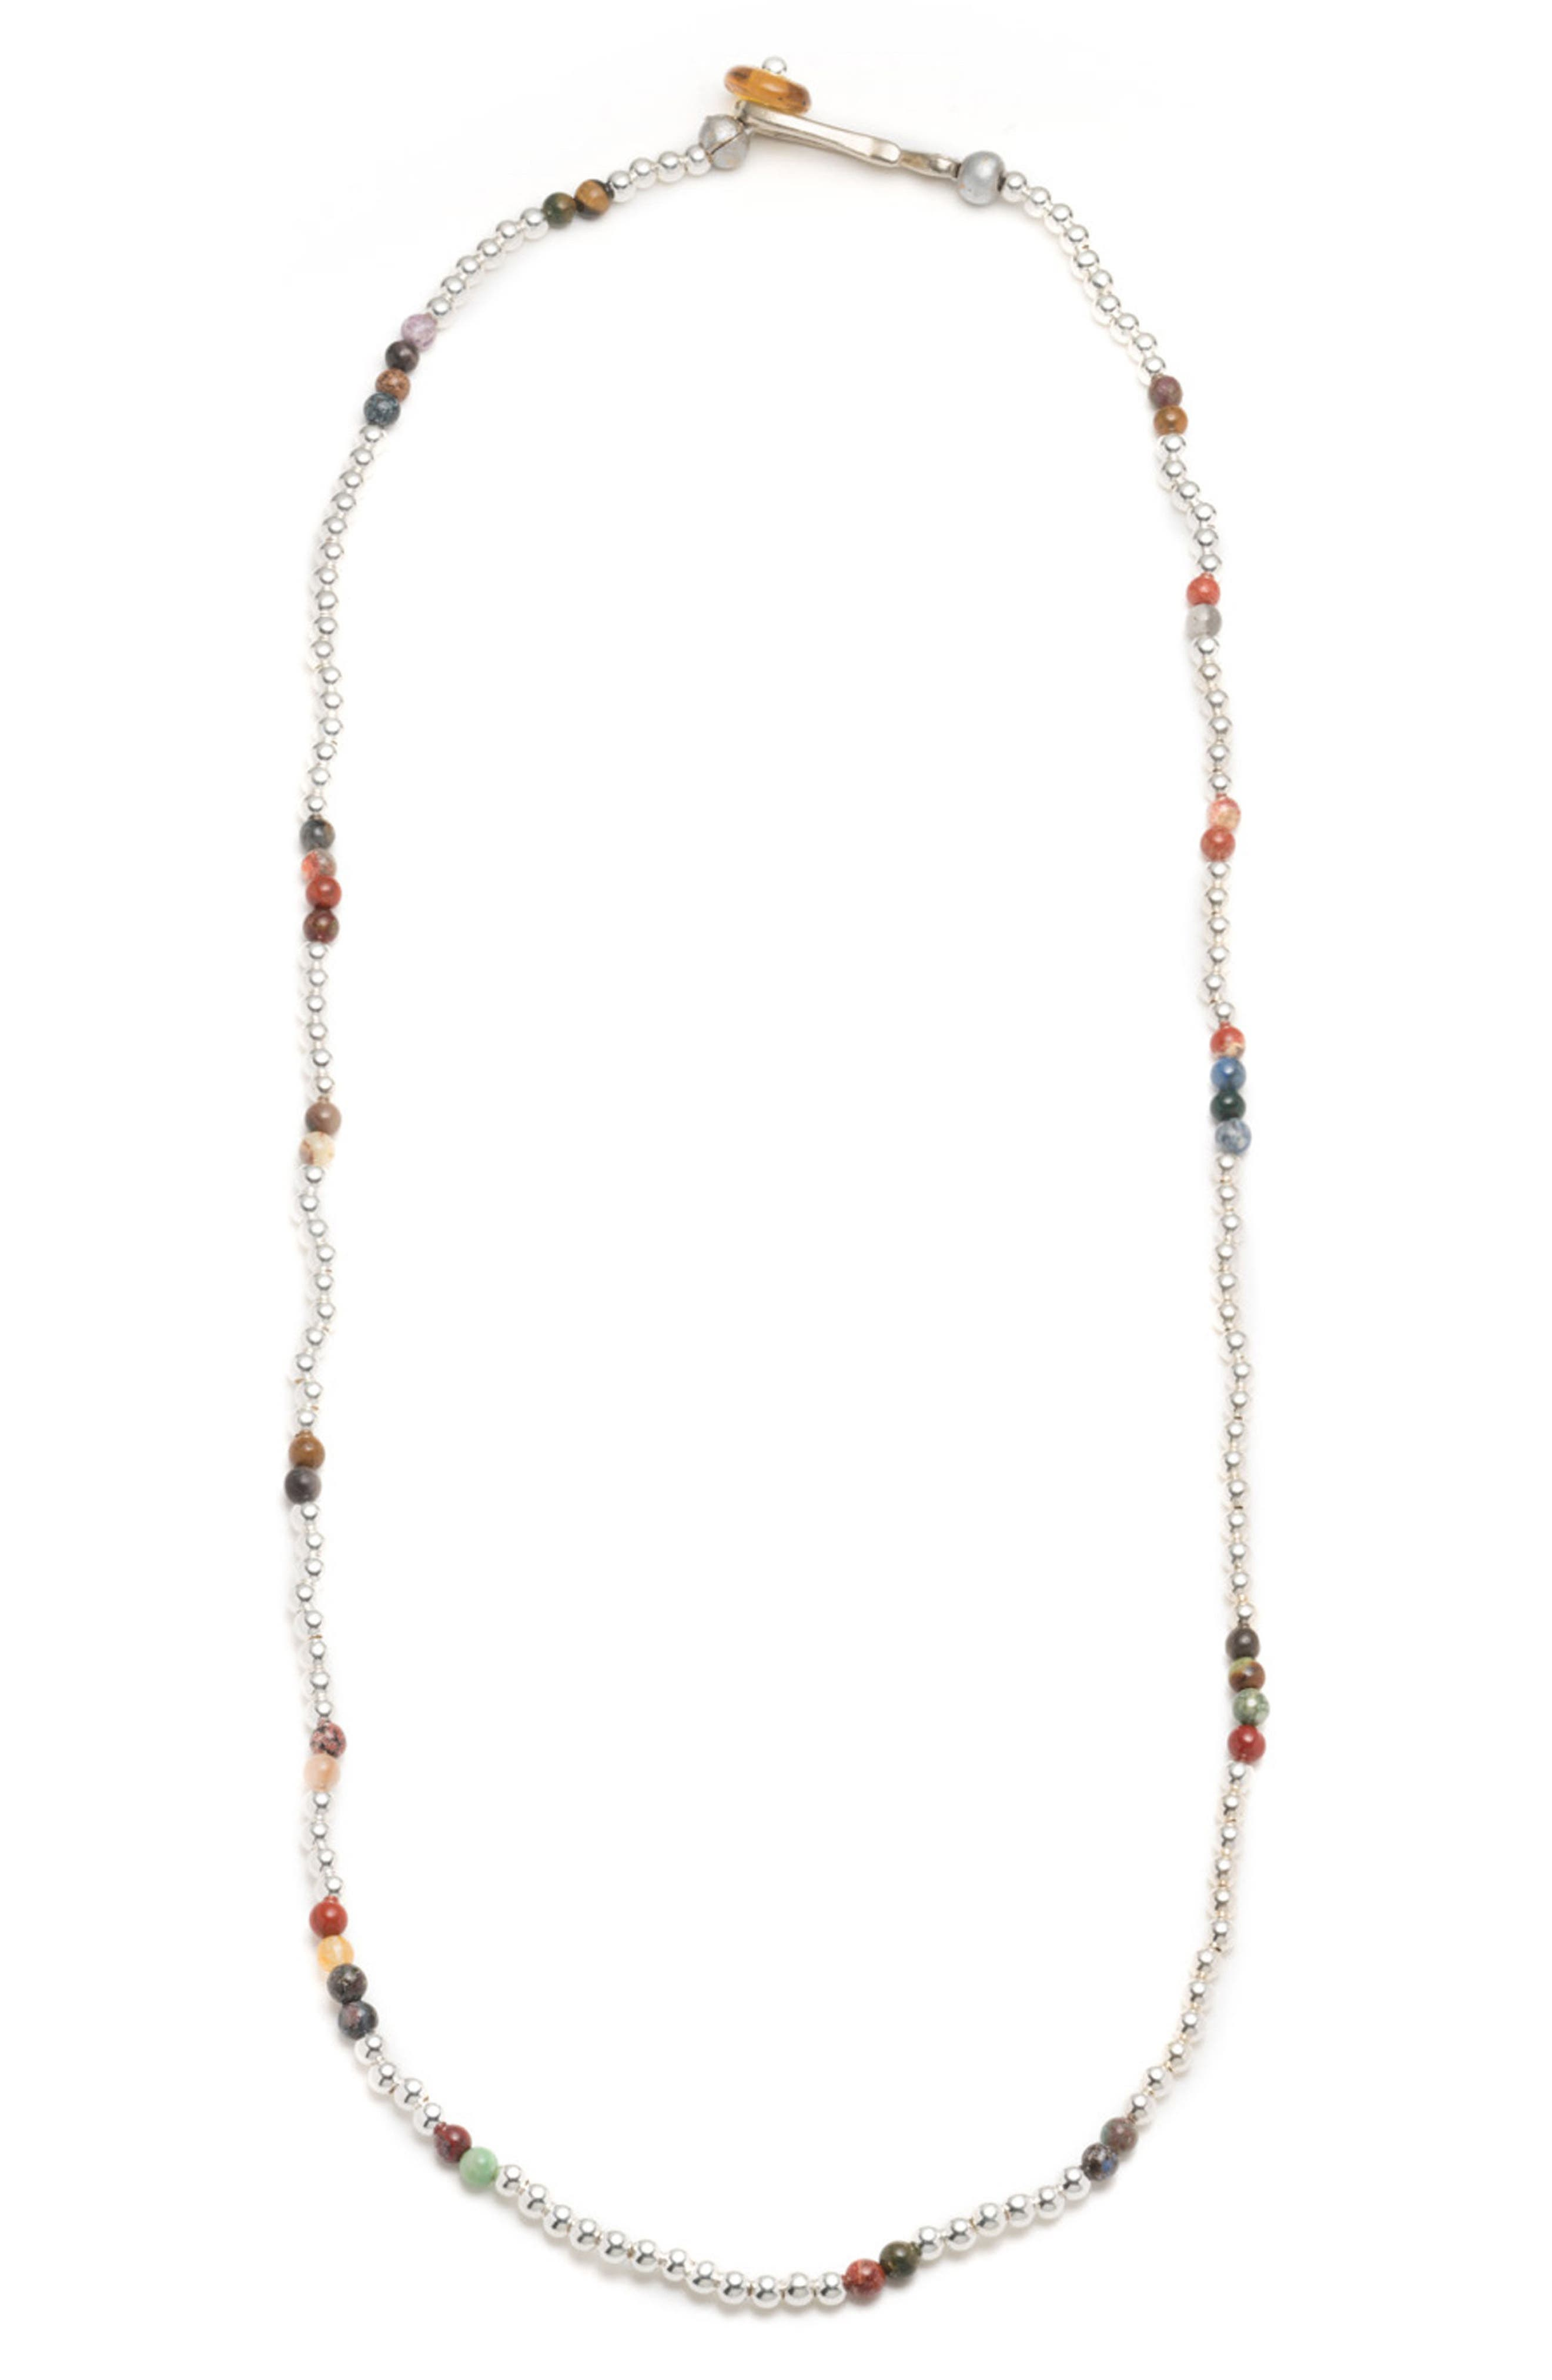 Essaouira Necklace,                             Main thumbnail 1, color,                             040